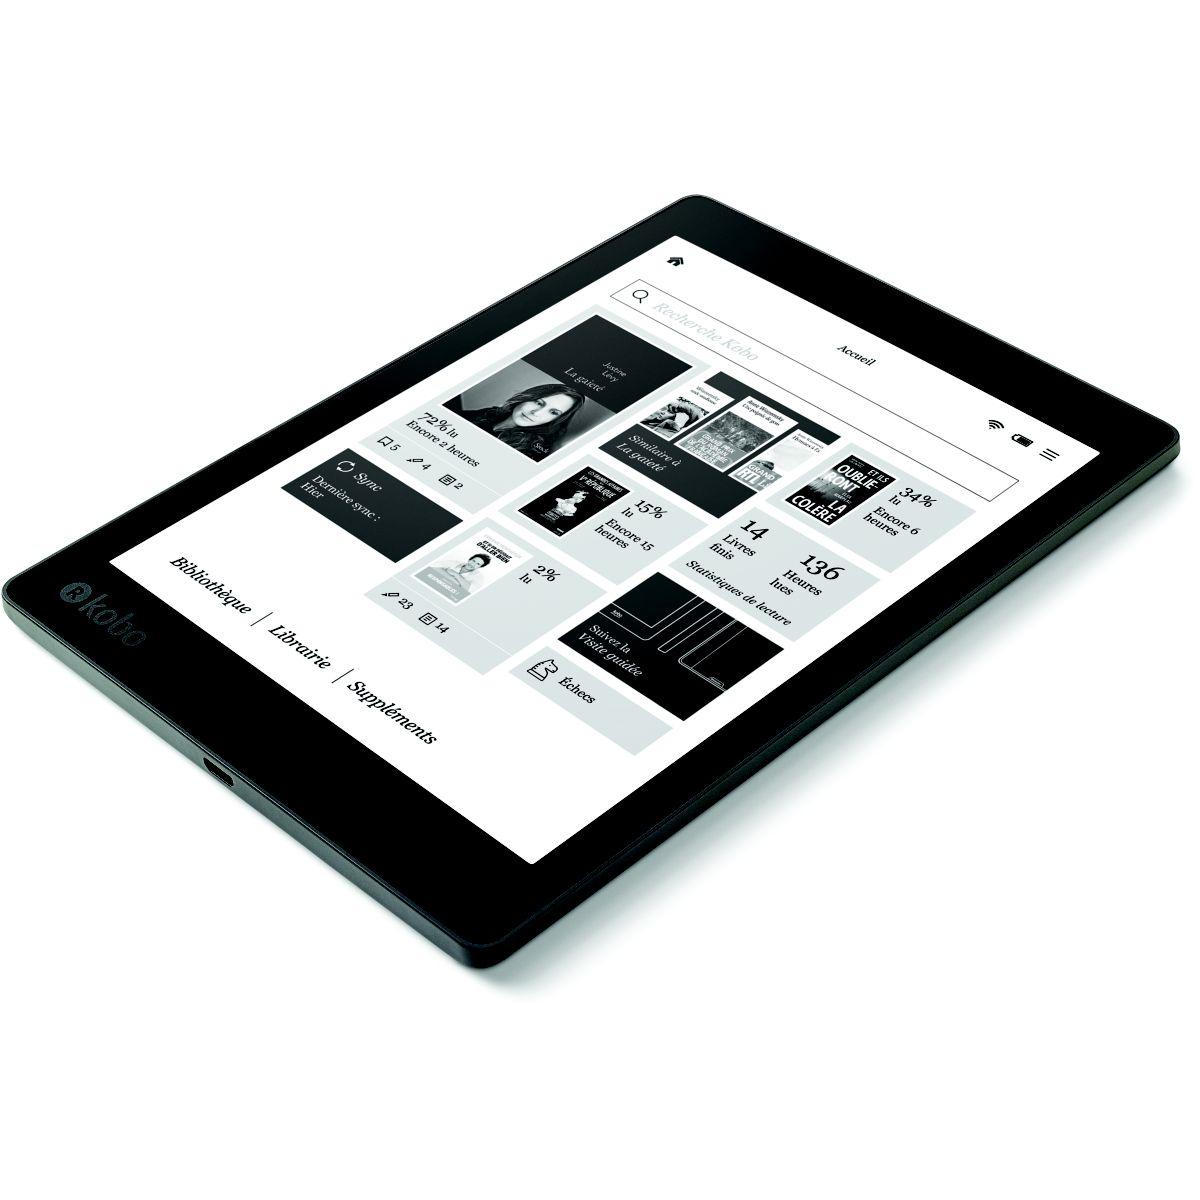 E-book kobo aura one - 2% de remise immédiate avec le code : anniv2 (photo)